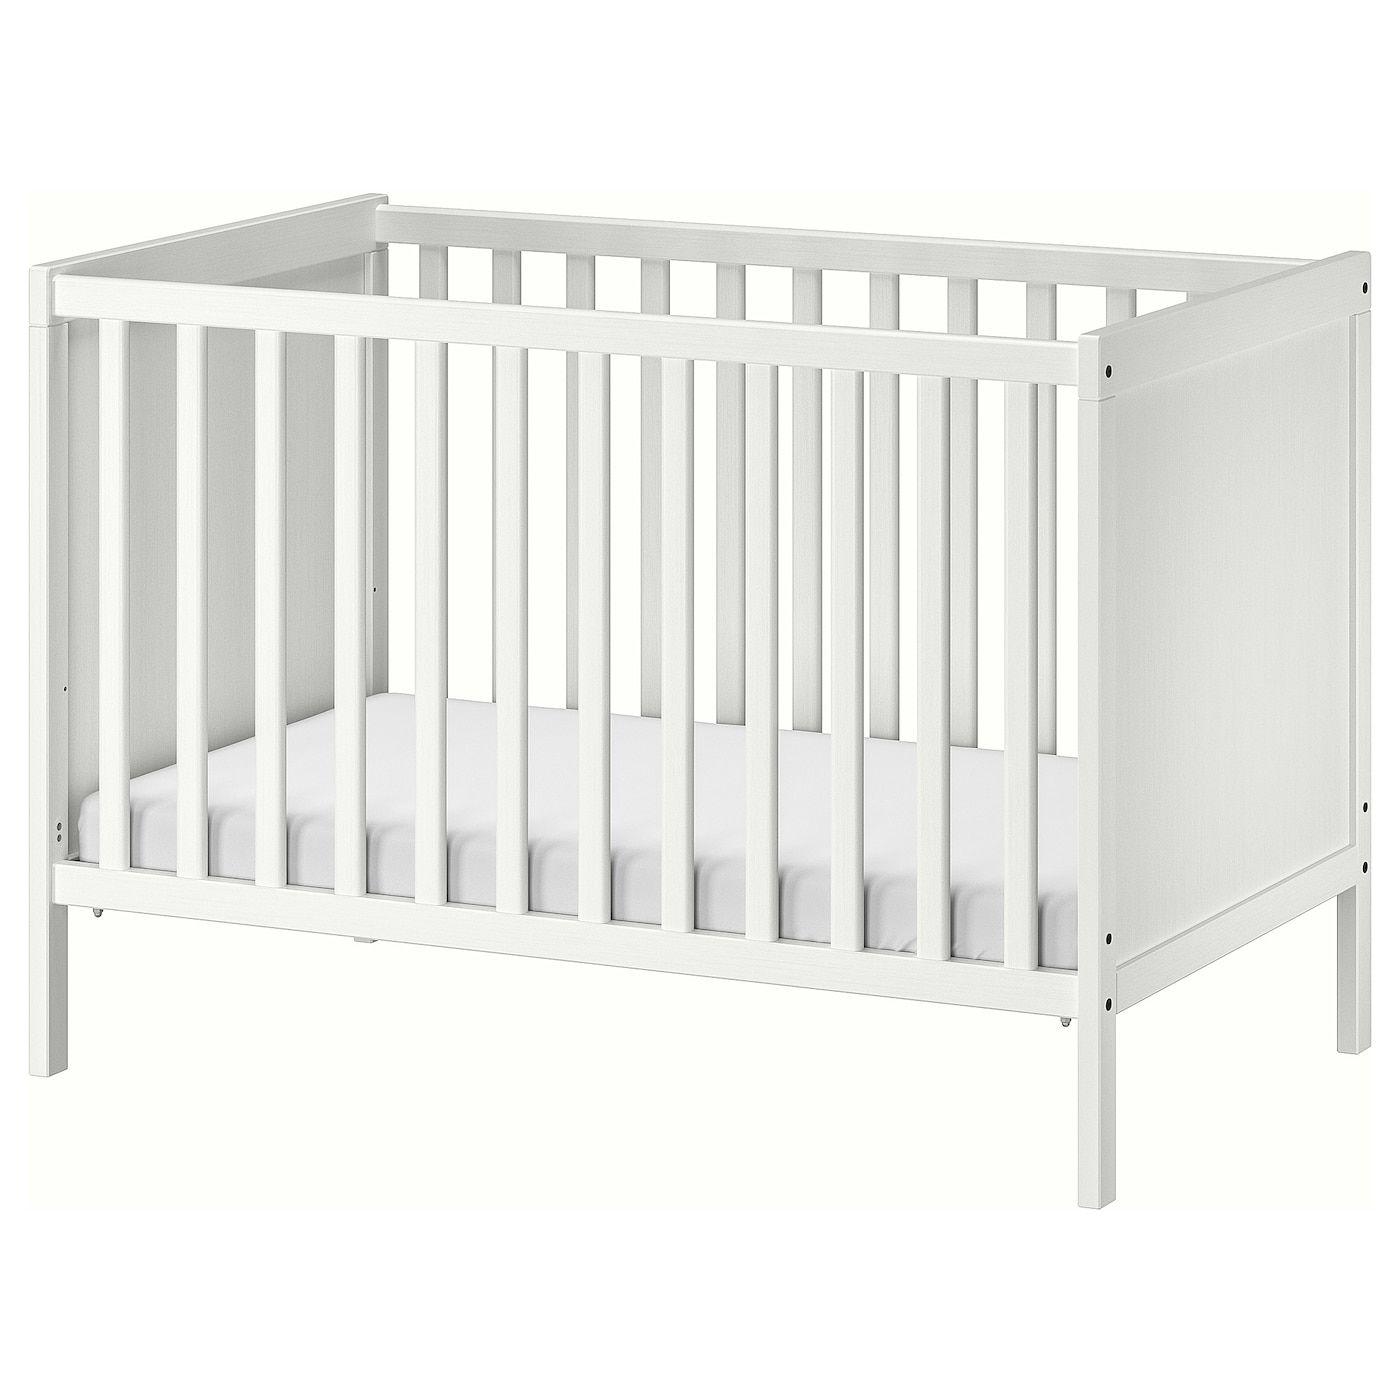 "SUNDVIK Crib - white 27 1/2x52 "" in 2020   Ikea crib, Ikea ..."